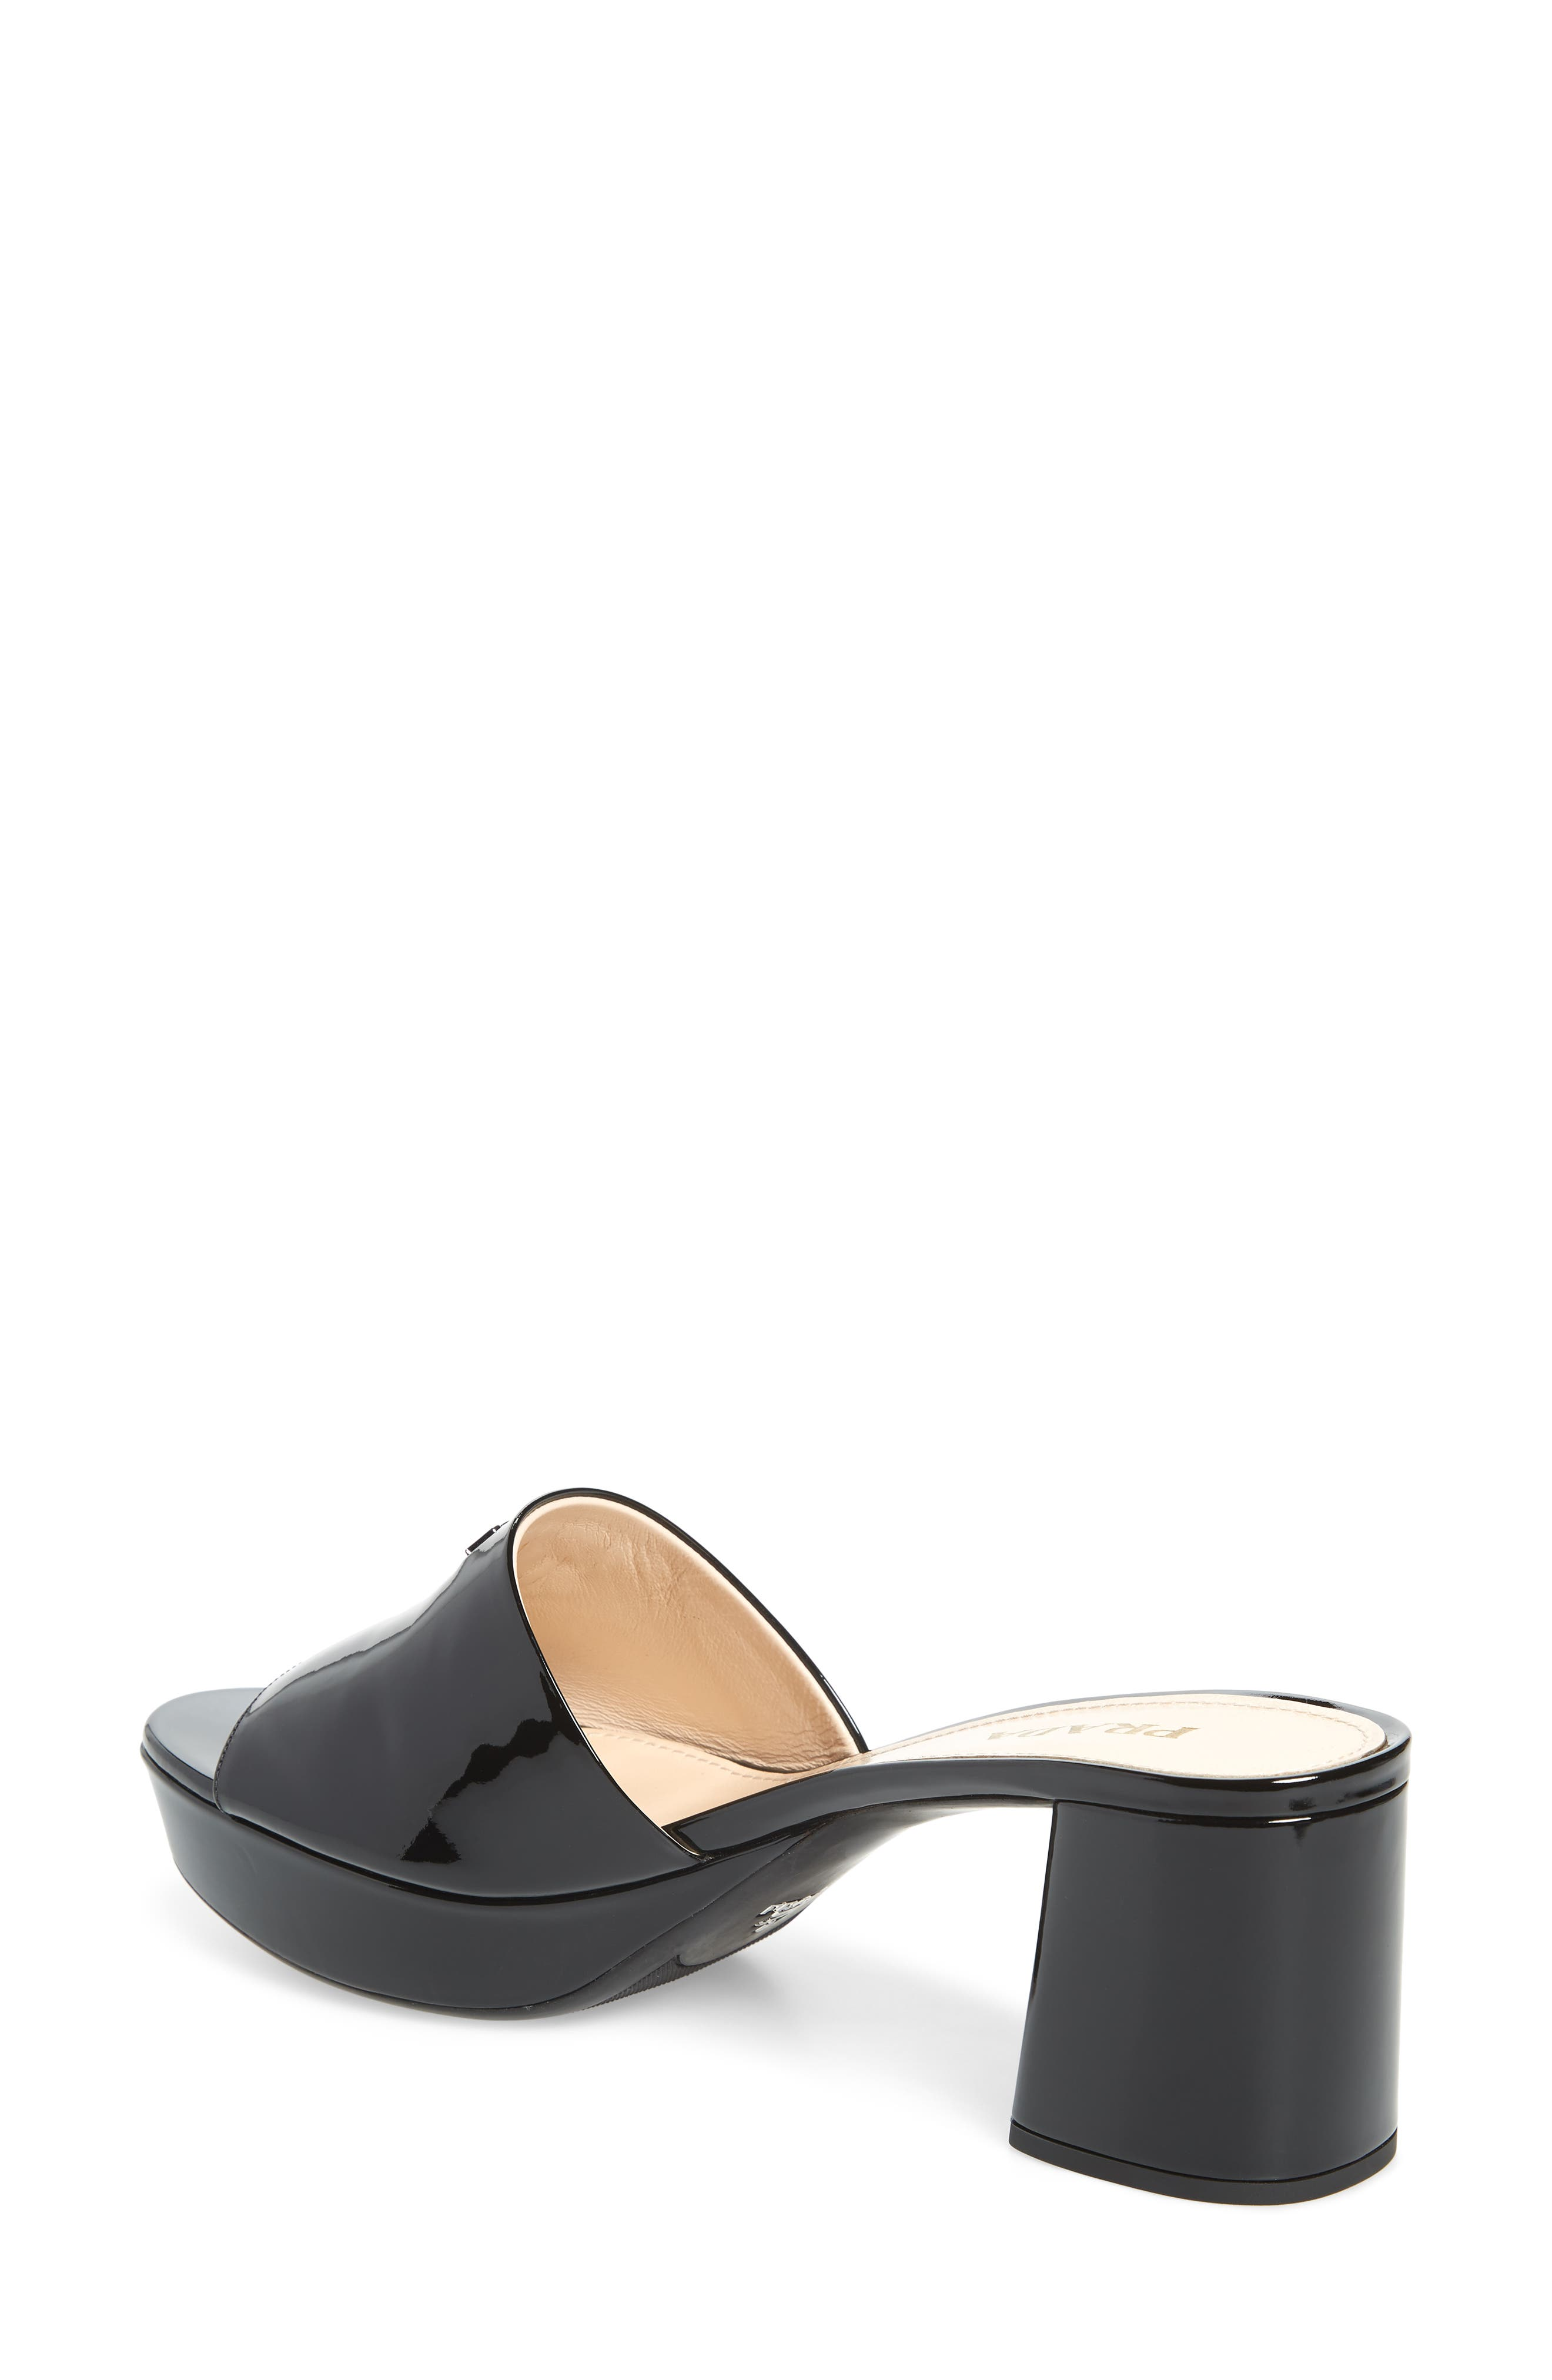 PRADA, Platform Slide Sandal, Alternate thumbnail 2, color, BLACK PATENT